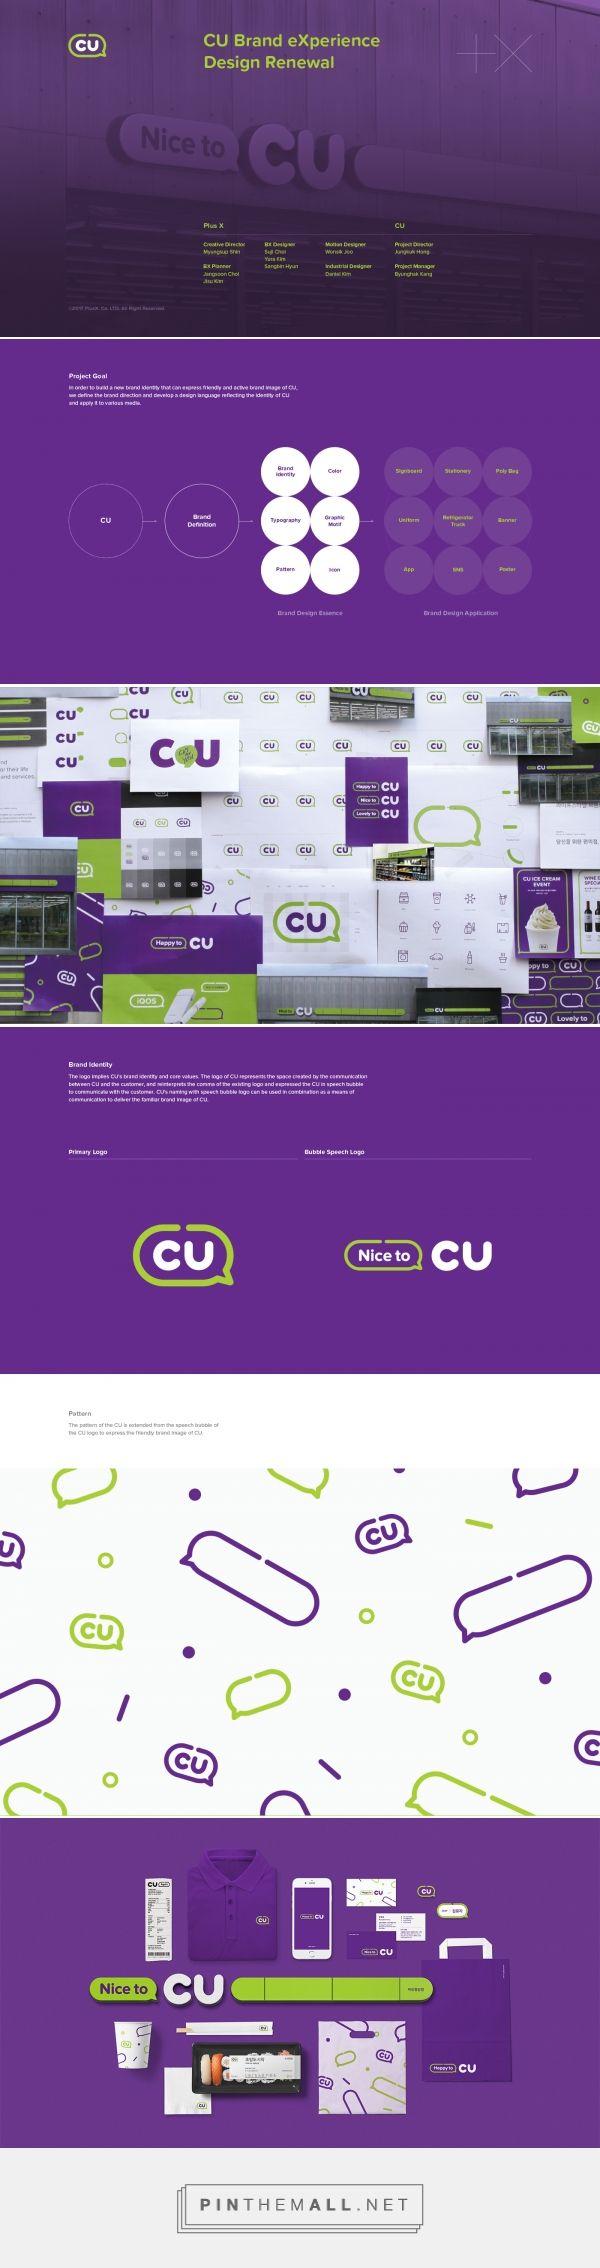 CU Brand eXperience Design Renewal on Behance